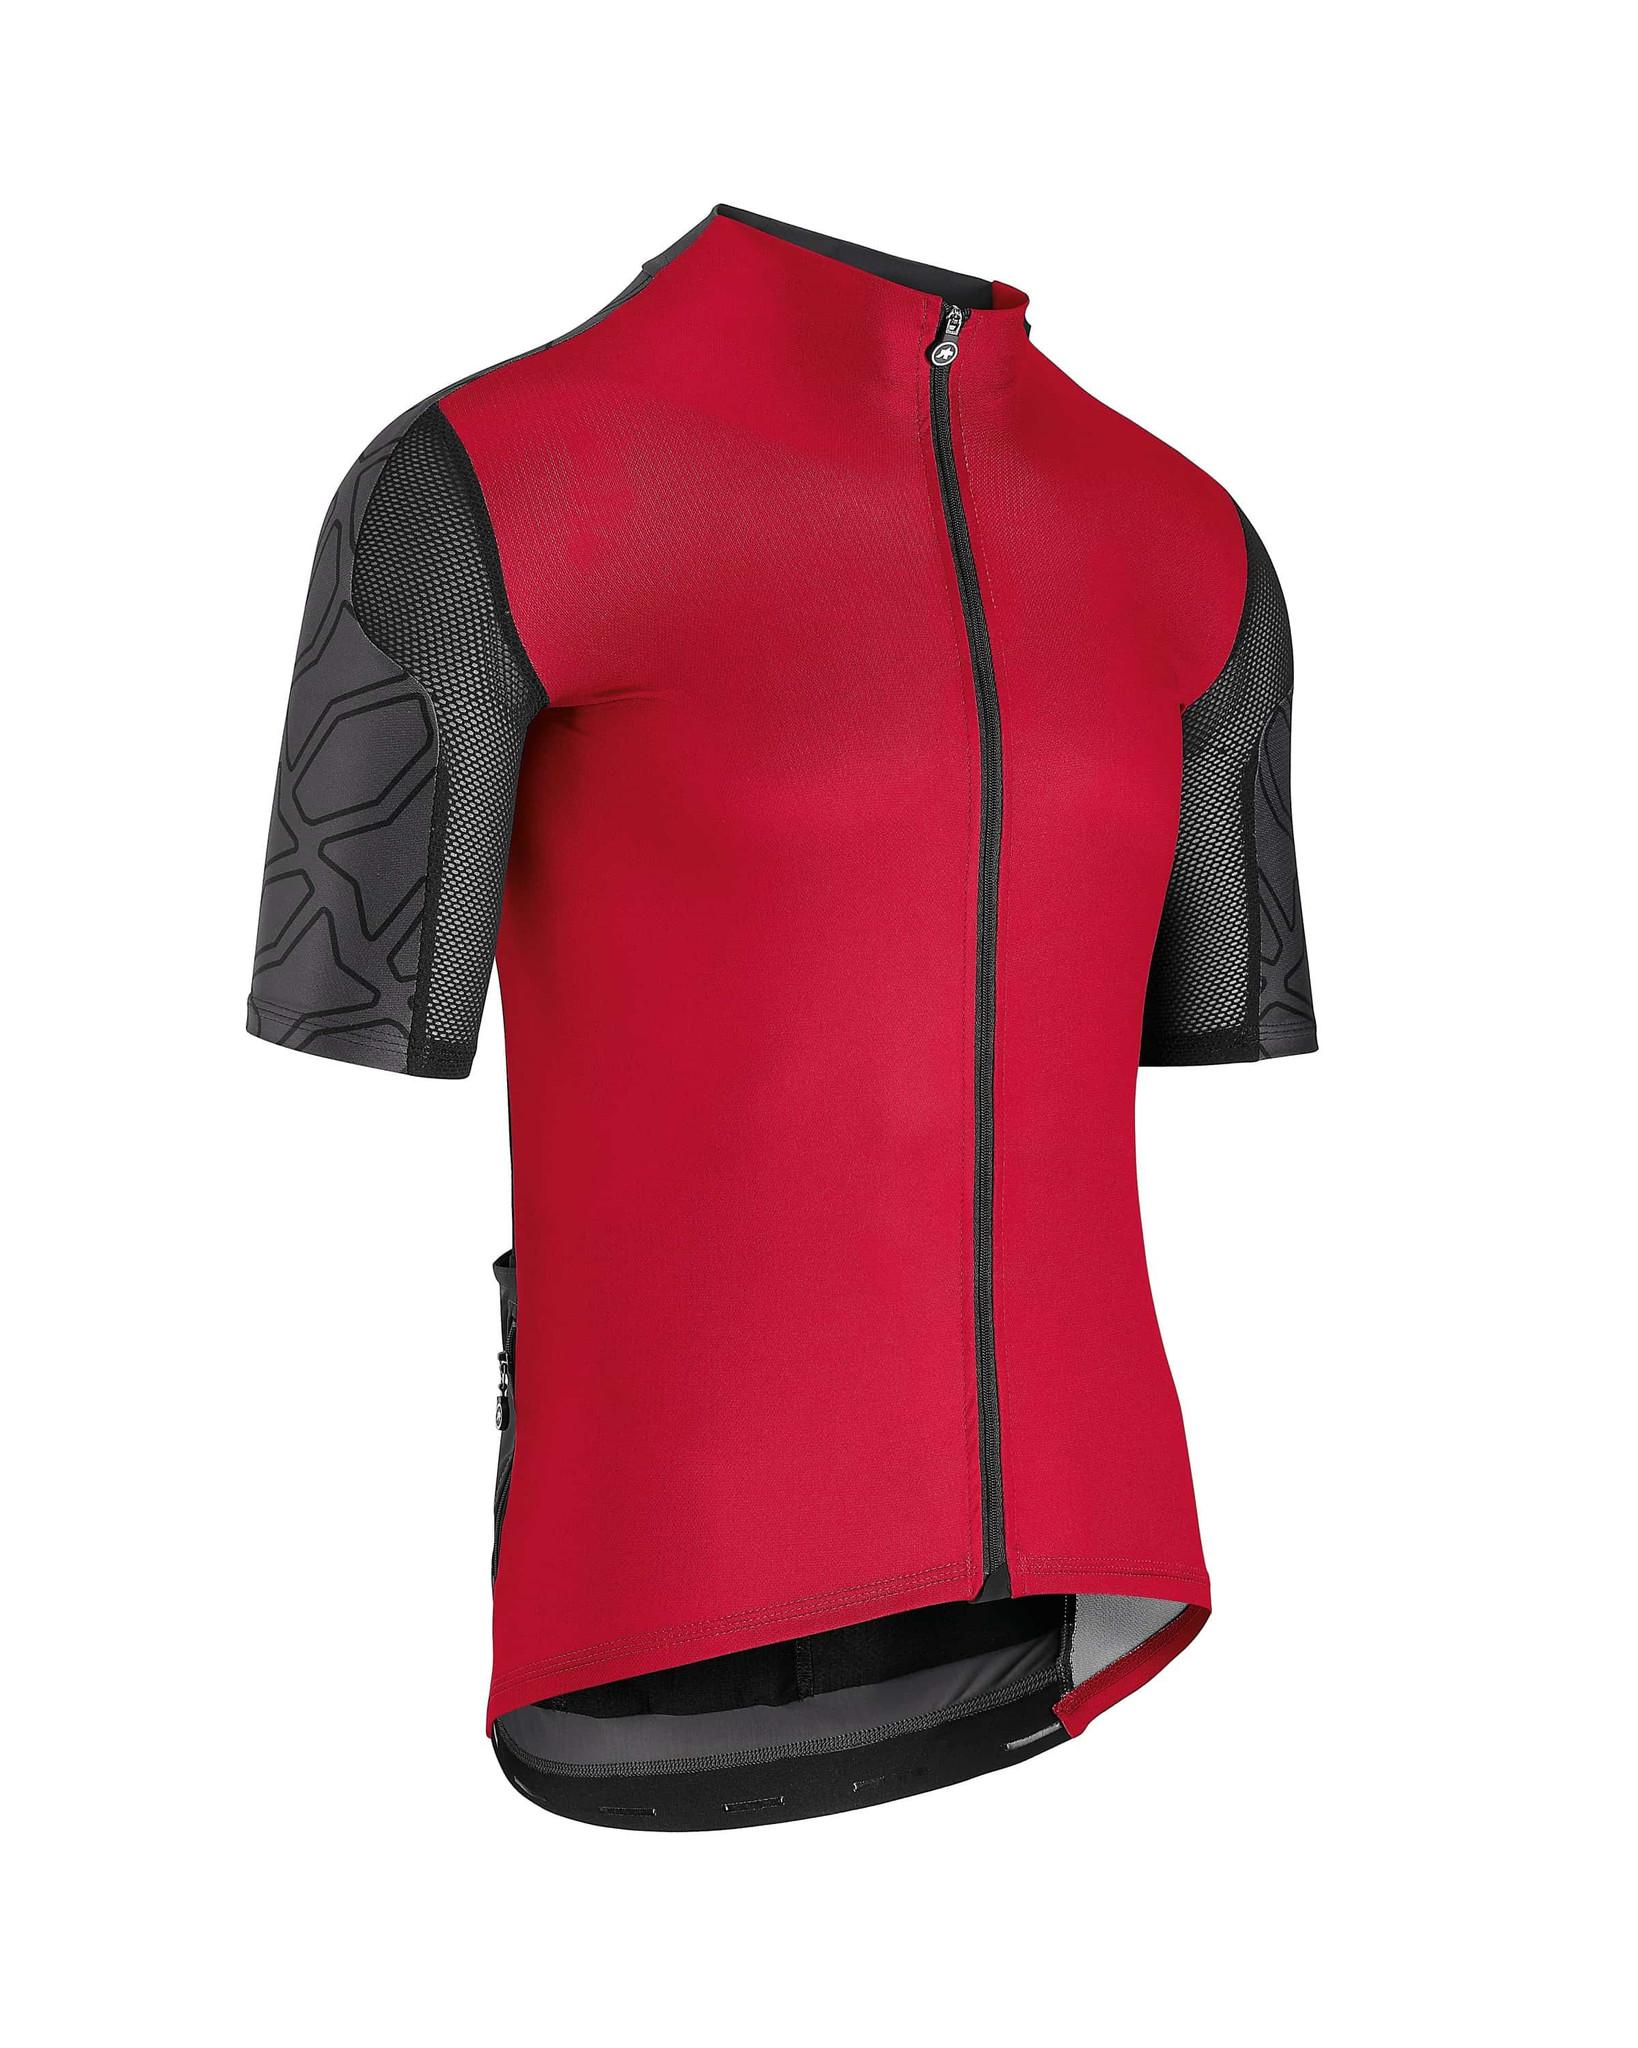 Assos Assos XC Shortsleeve jersey MTB Shirt Rood